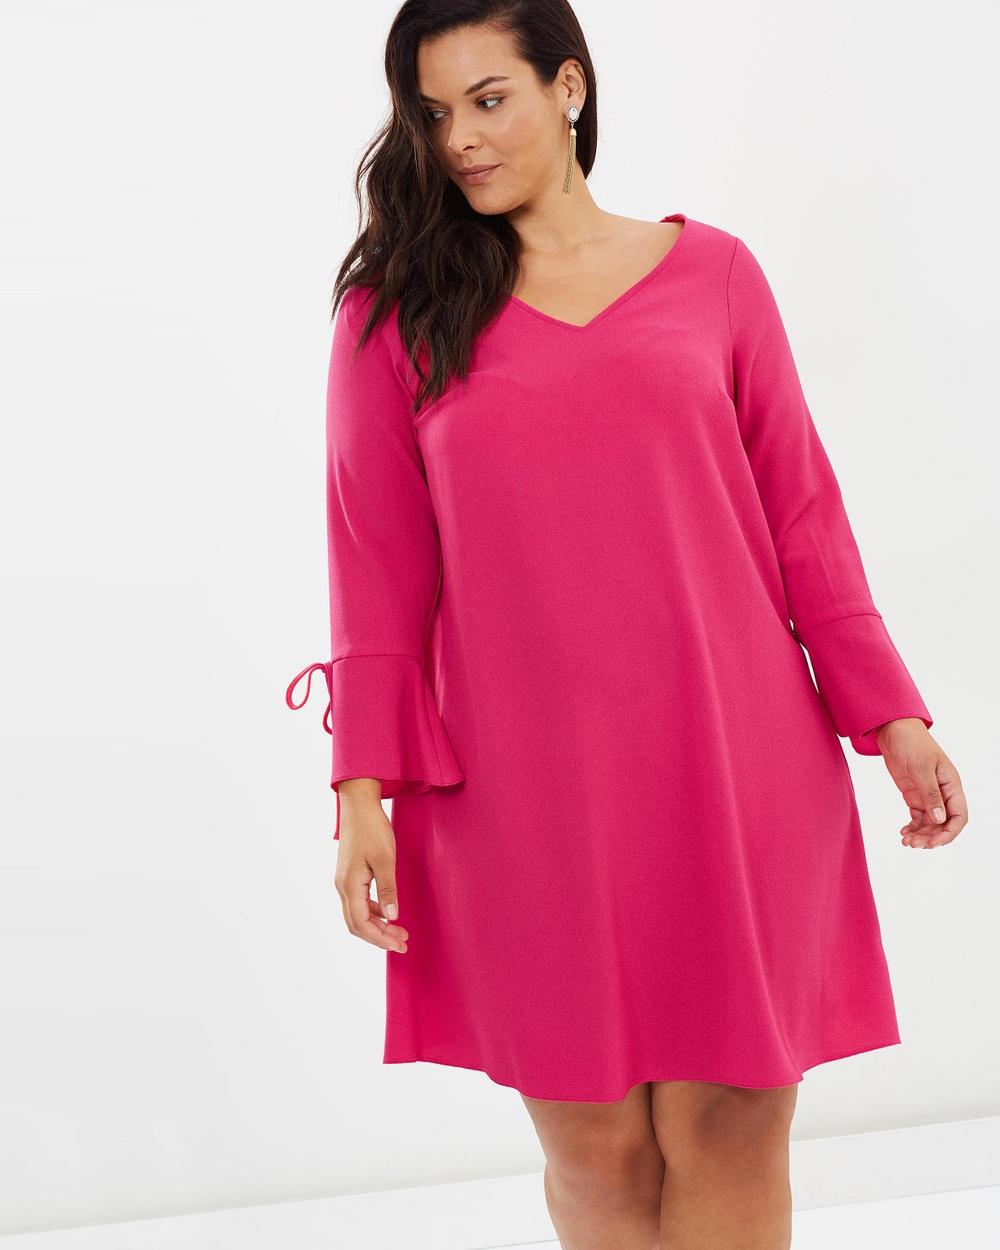 EVANS Tie Sleeve Shift Dress Dresses Pink Tie Sleeve Shift Dress